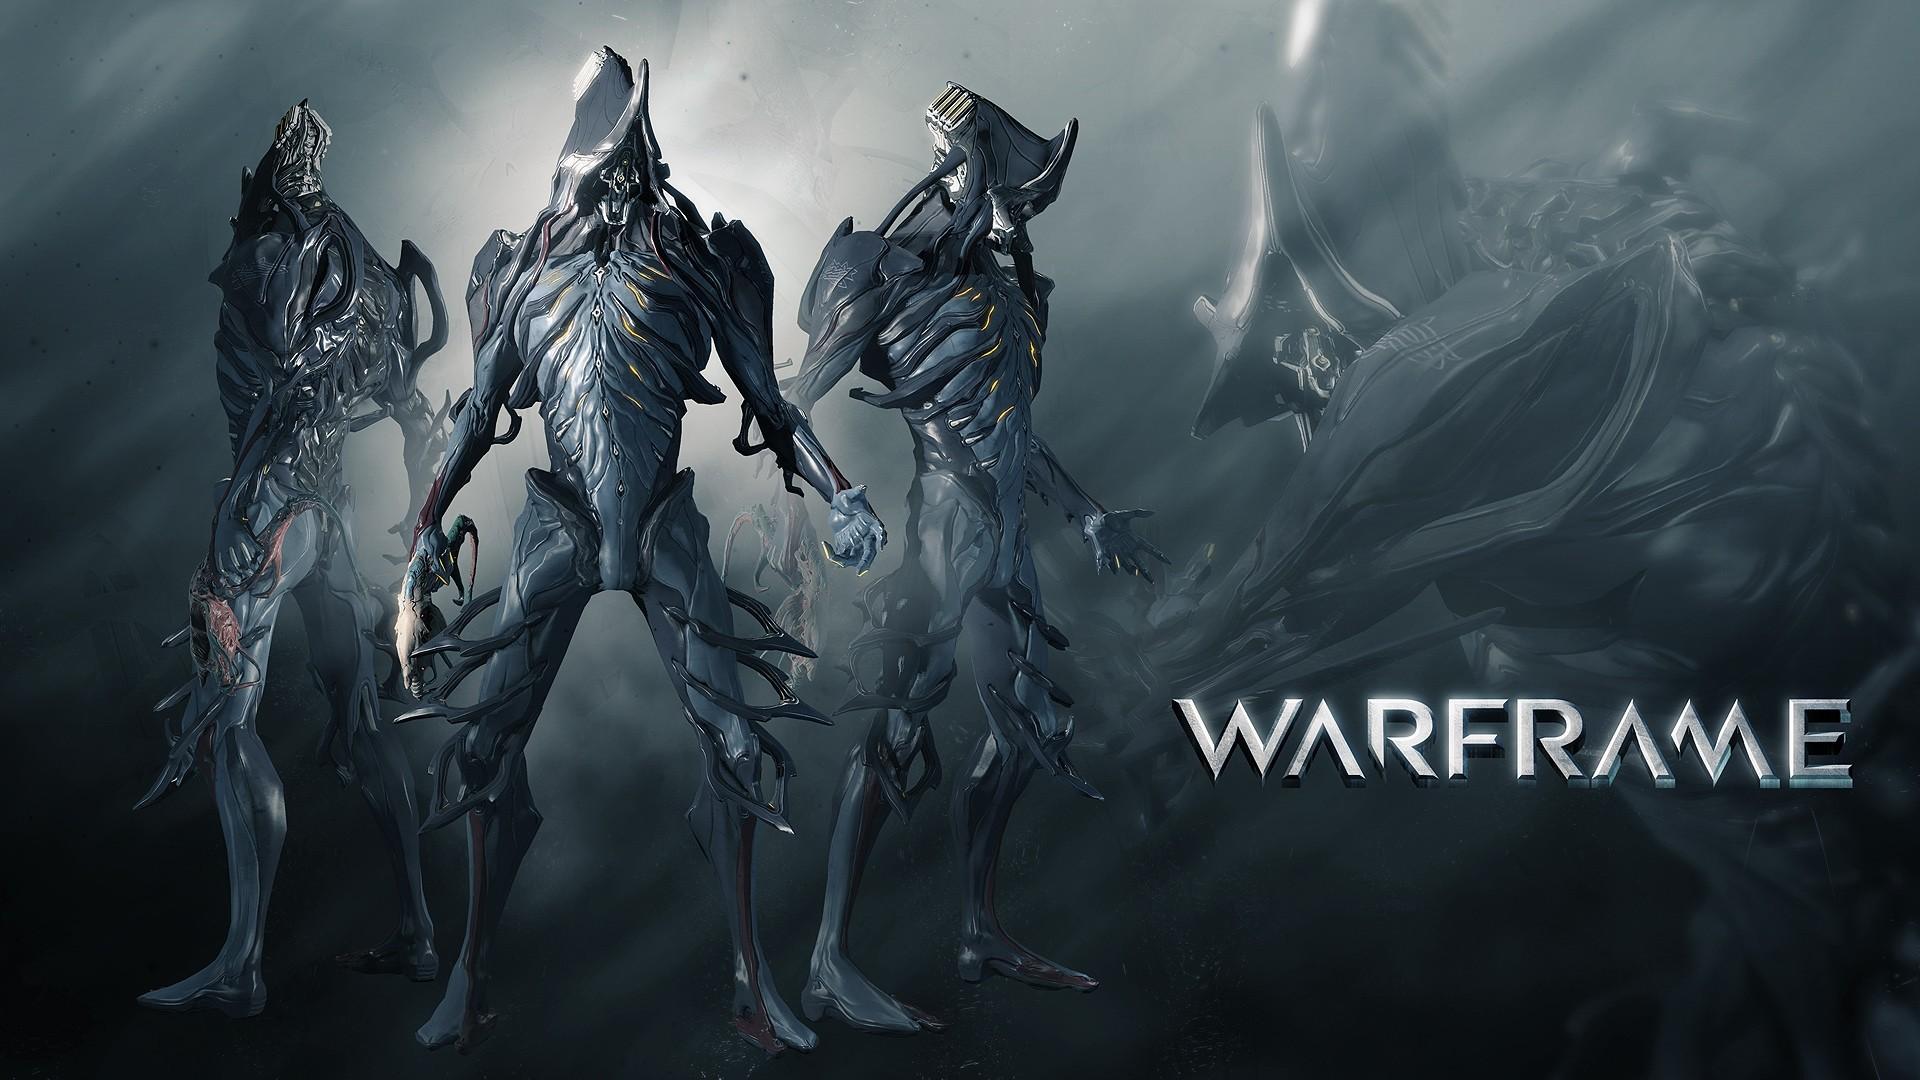 Nekros Warframe wallpaper x